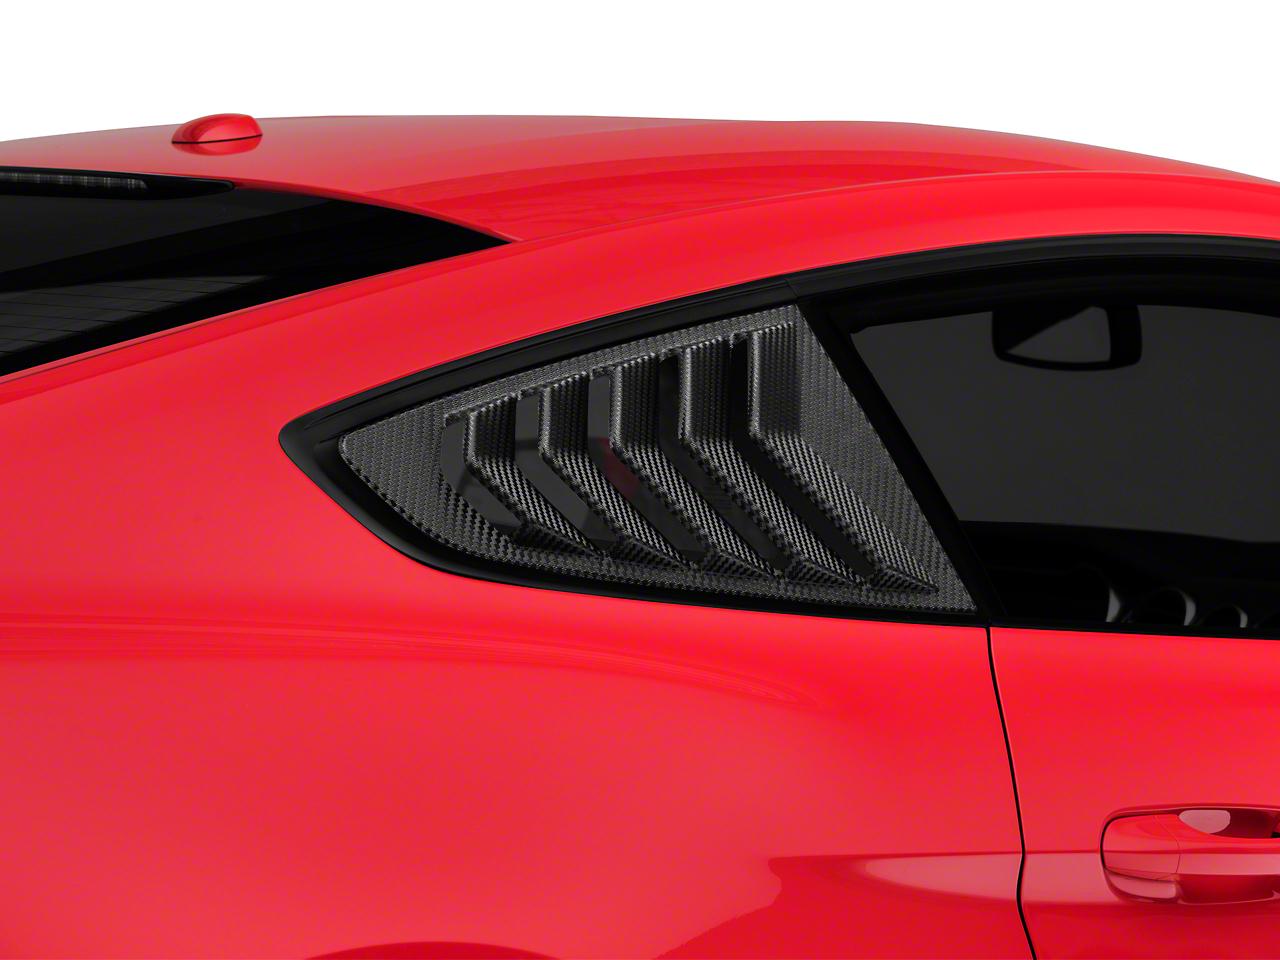 SpeedForm Sport Quarter Window Louver - Textured Carbon Appearance (15-19 Fastback)